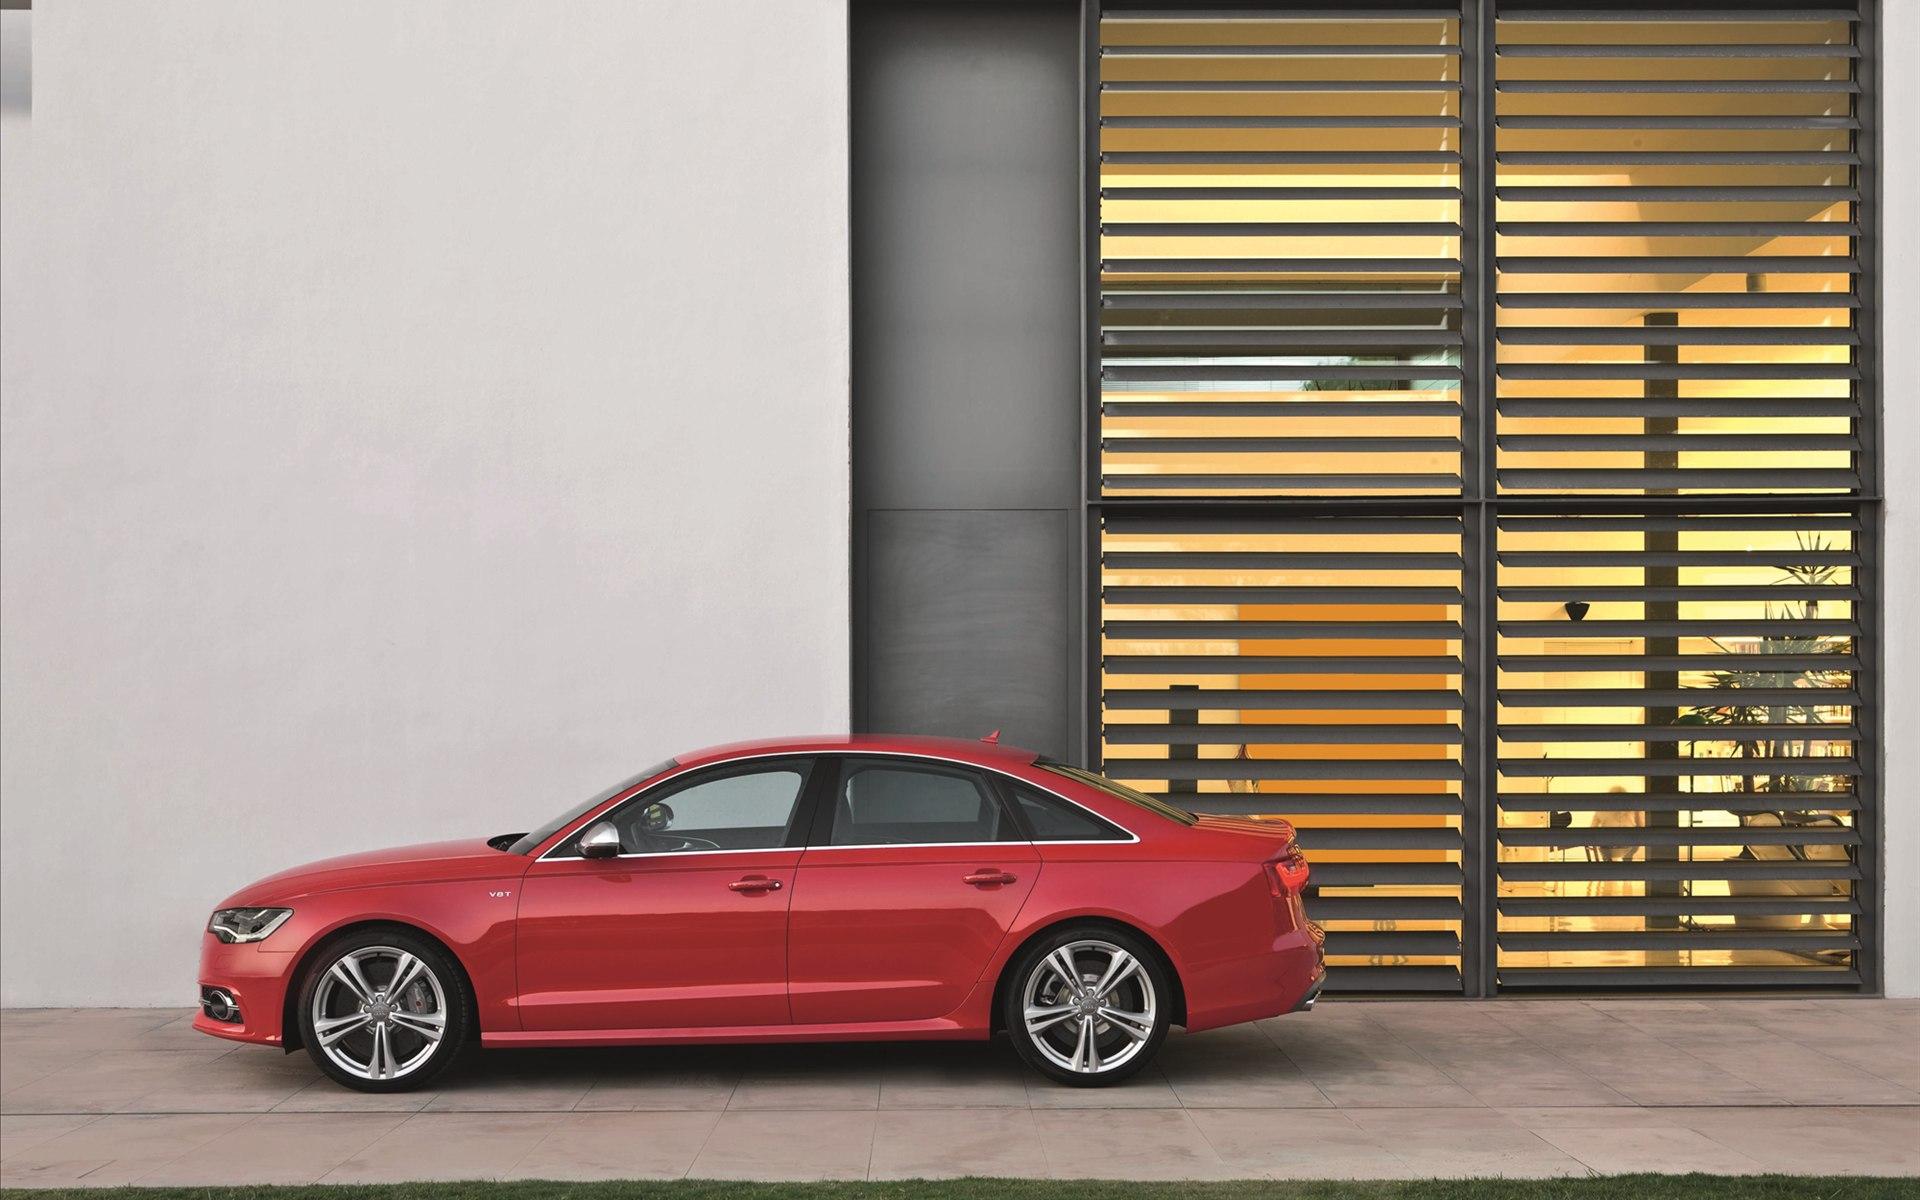 2013-Audi-S6-Images-3.jpg